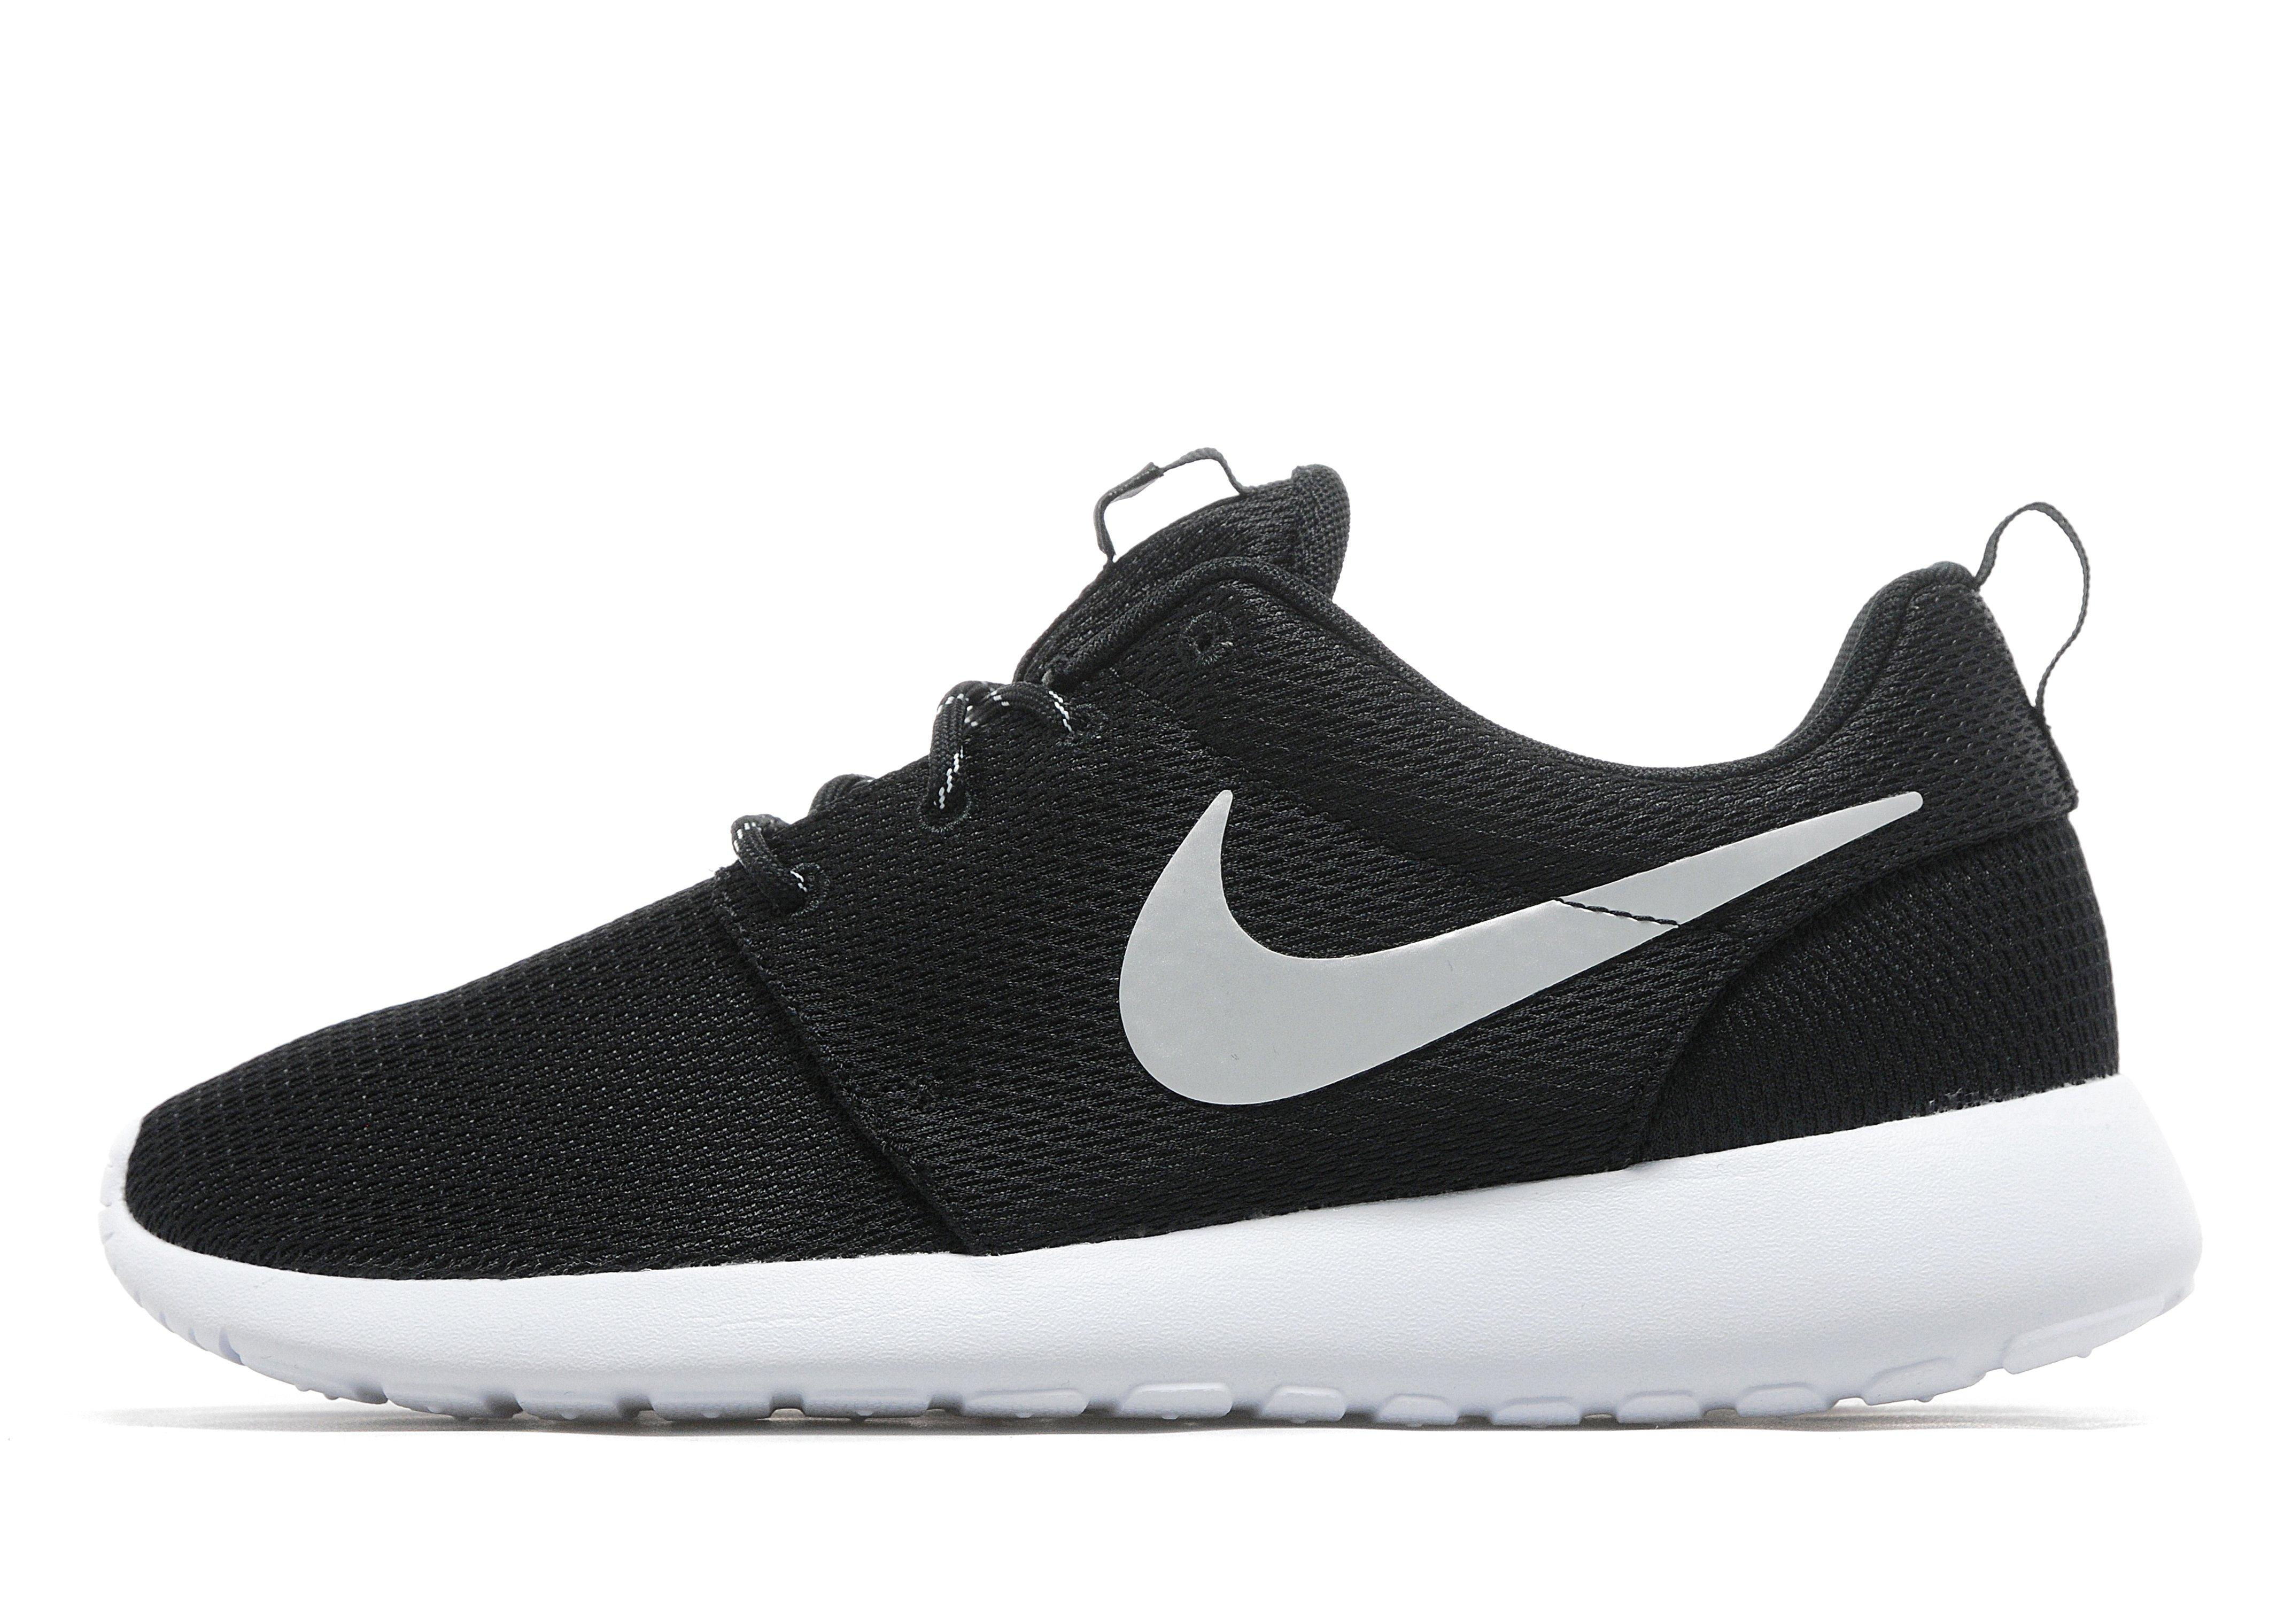 3b9e948b509 ouasna Nike Run Roshe Archives   Paint Or Thread  Custom Sneakers ...